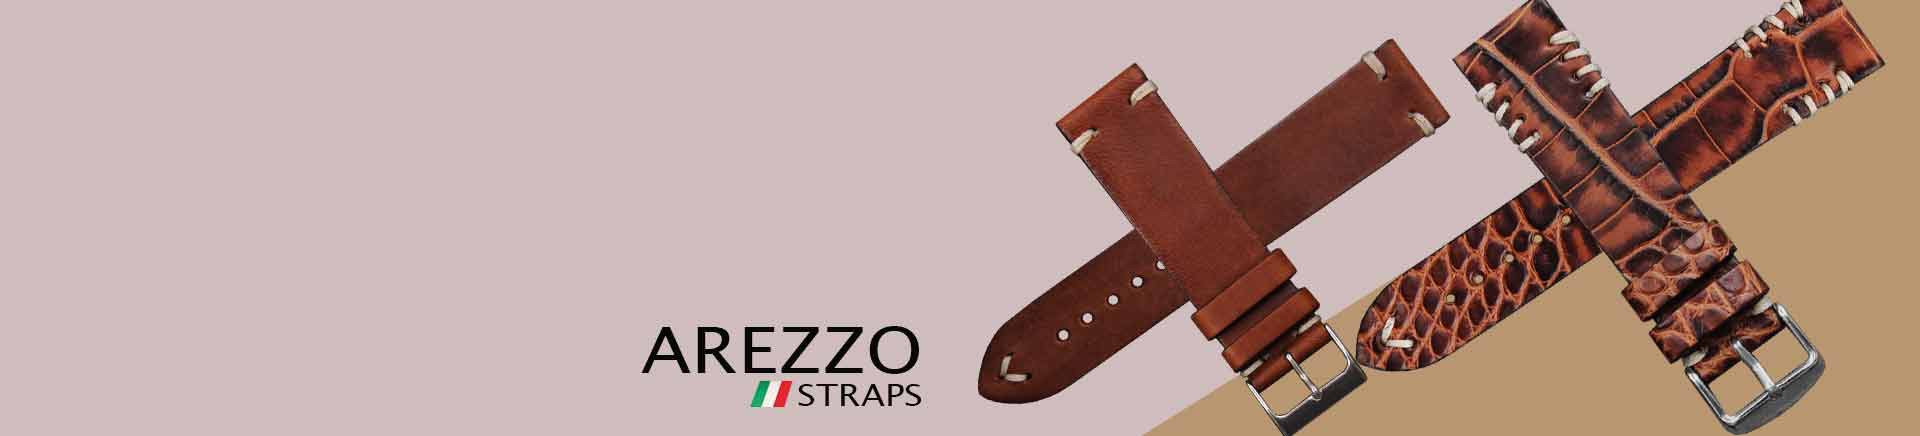 arezzo straps bracelets de montres panerai